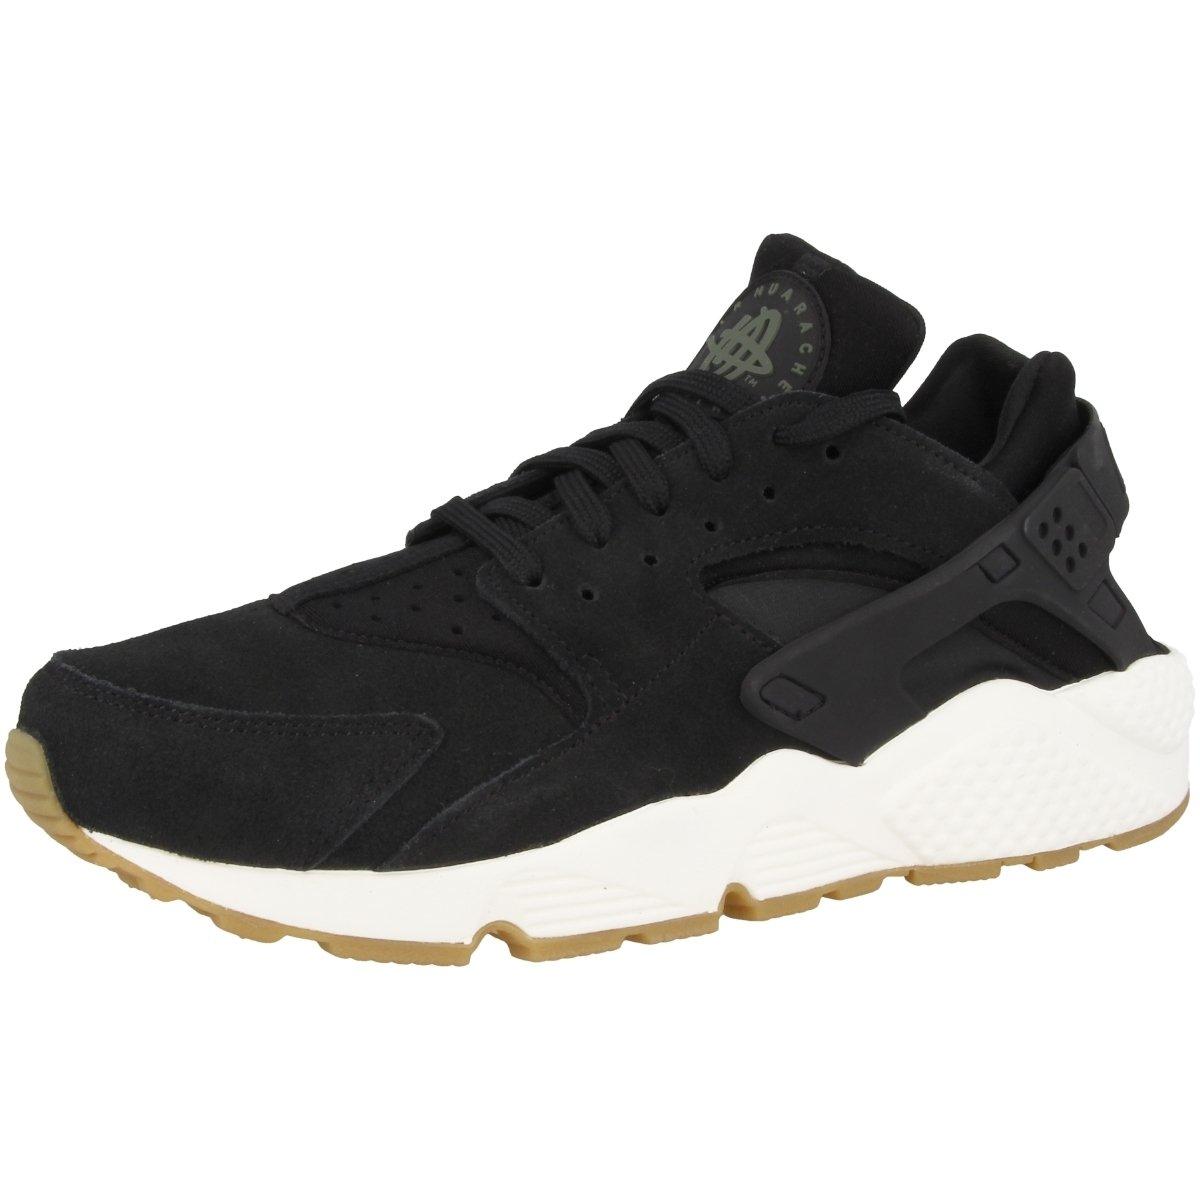 huge selection of 53c7c 37b16 Nike WMNS Air Huarache Run SD - Chaussures Sportives, Femme, Noir - (Black/Deep  Green-sail-Gum Light Brown): Amazon.fr: Sports et Loisirs